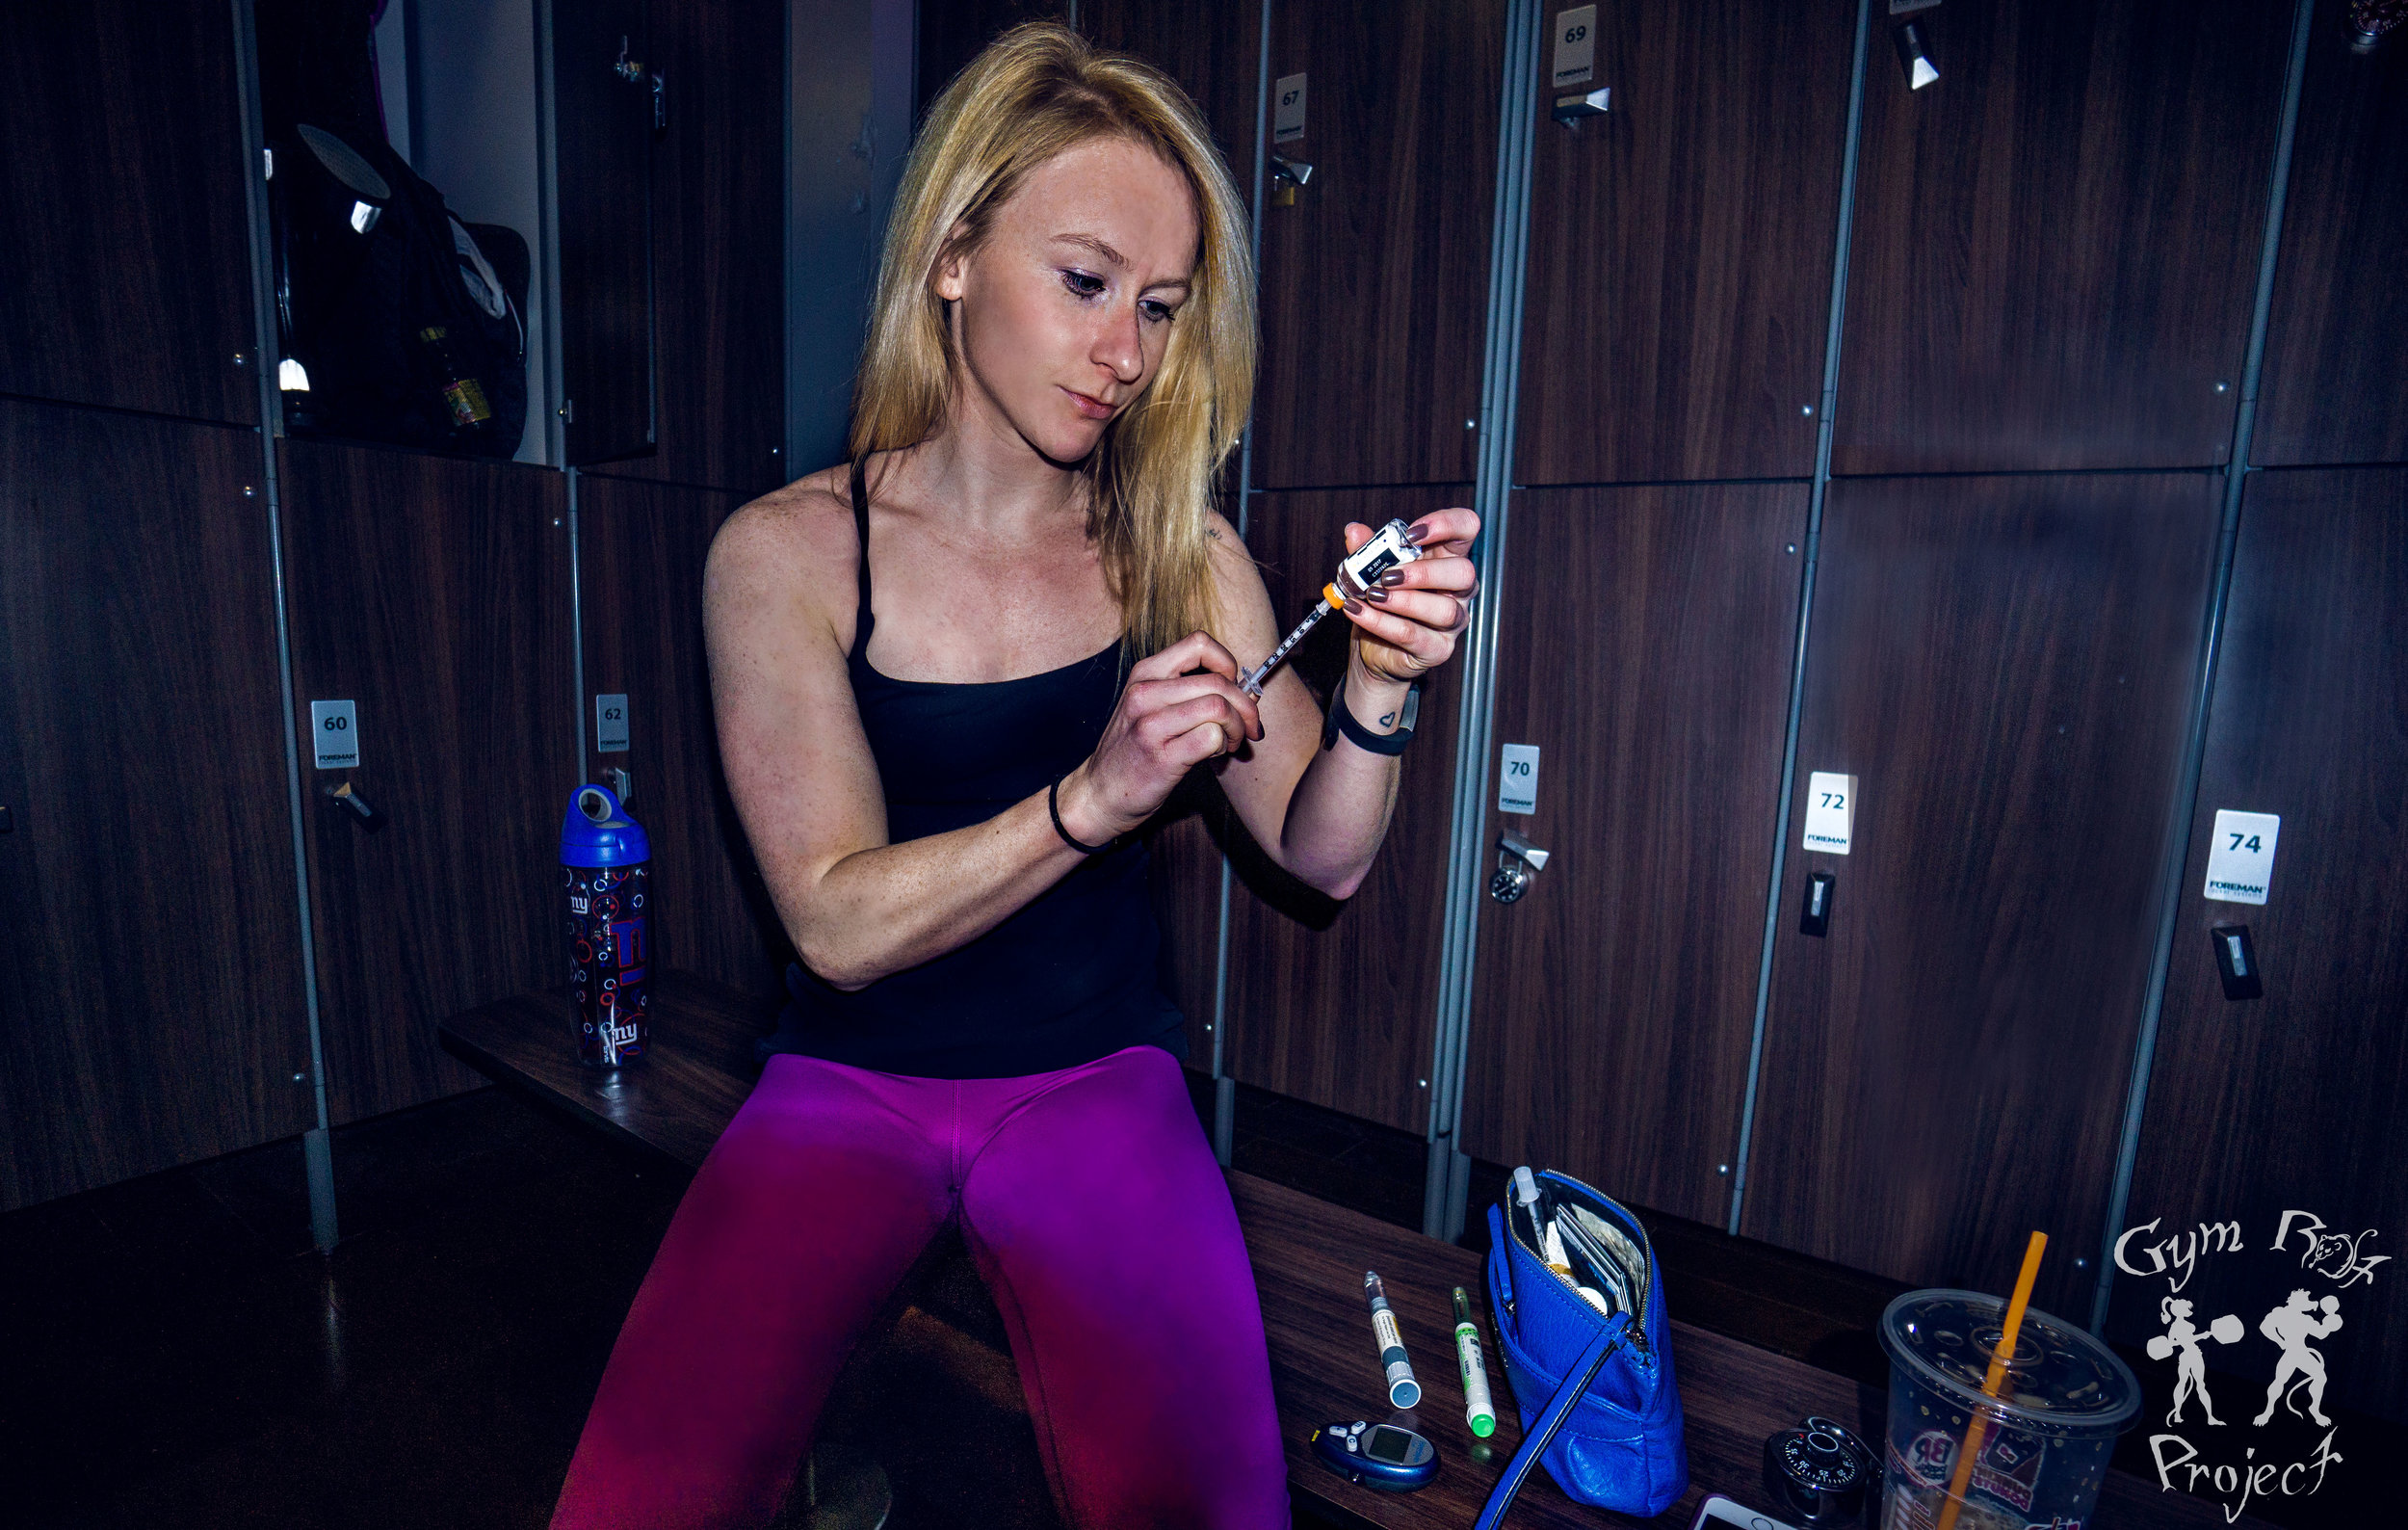 gym-rat-project-vickygood-photography.jpg